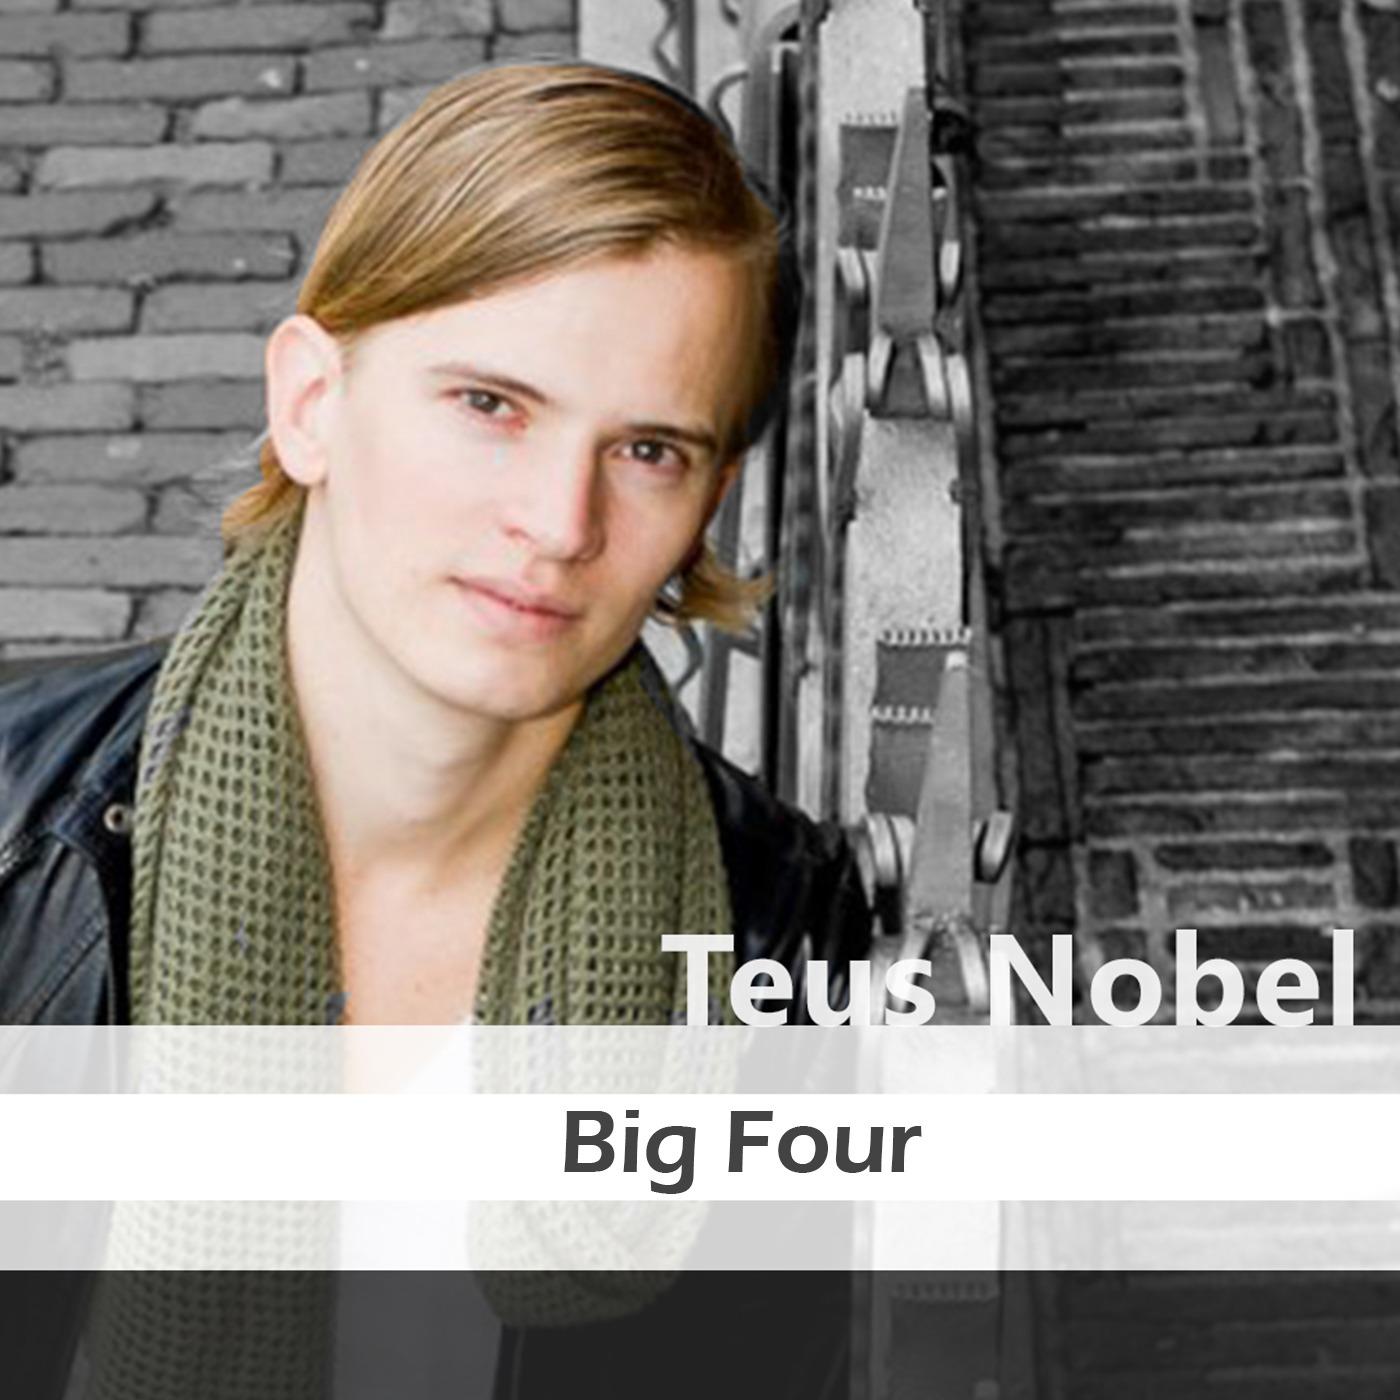 Nieuwe single Teus Nobel LMQ – Big Four